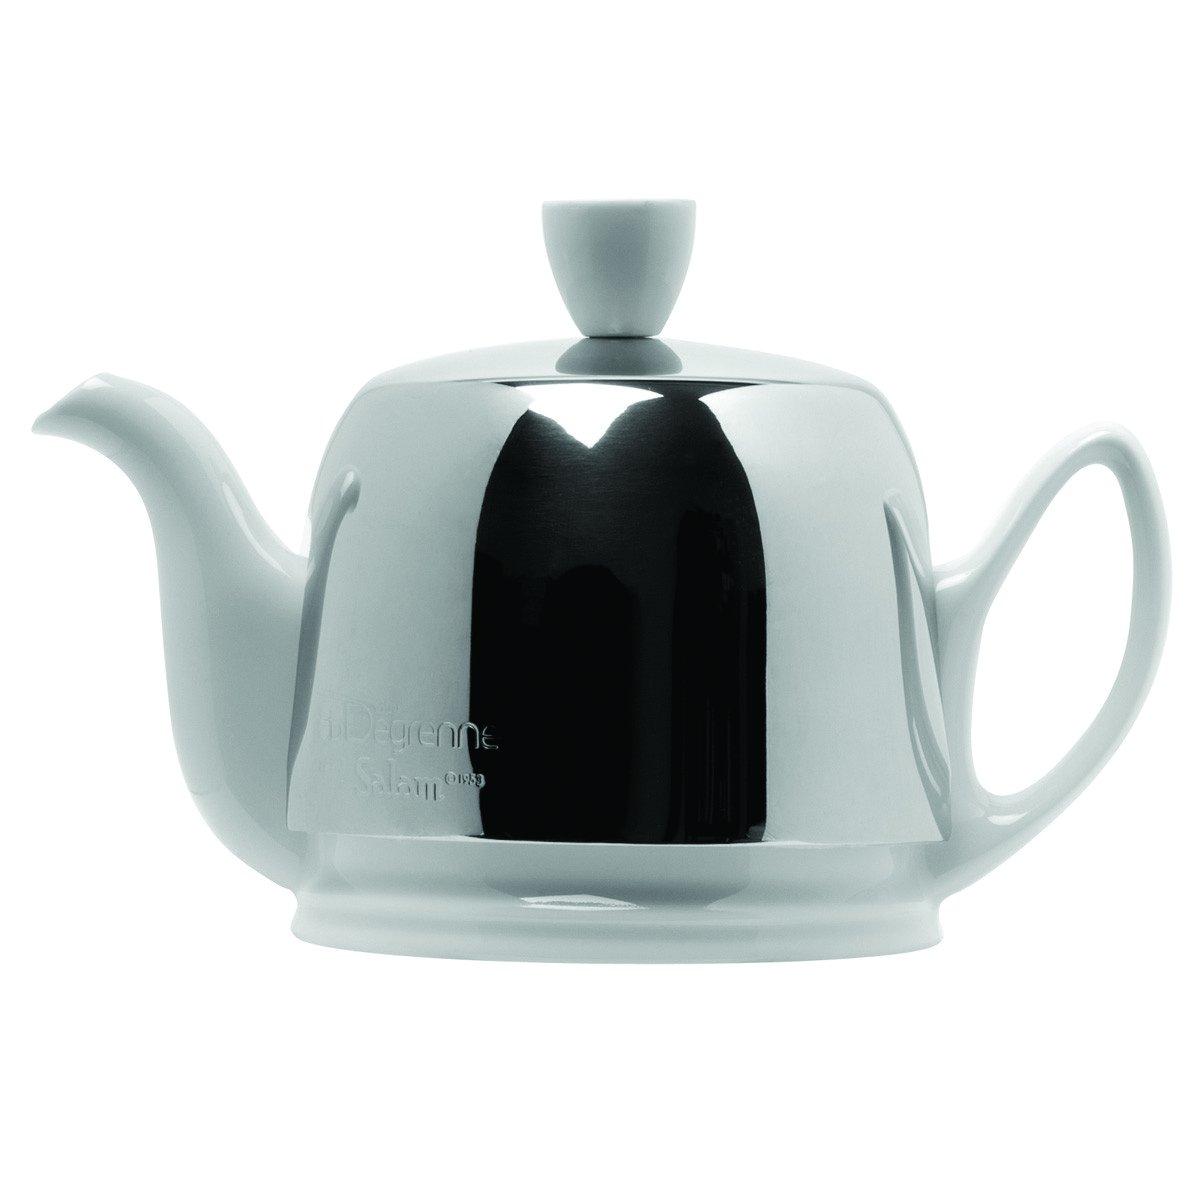 DEGRENNE -  SALAM WHITE Tea Pot 2 Cups, 11 oz 13/16